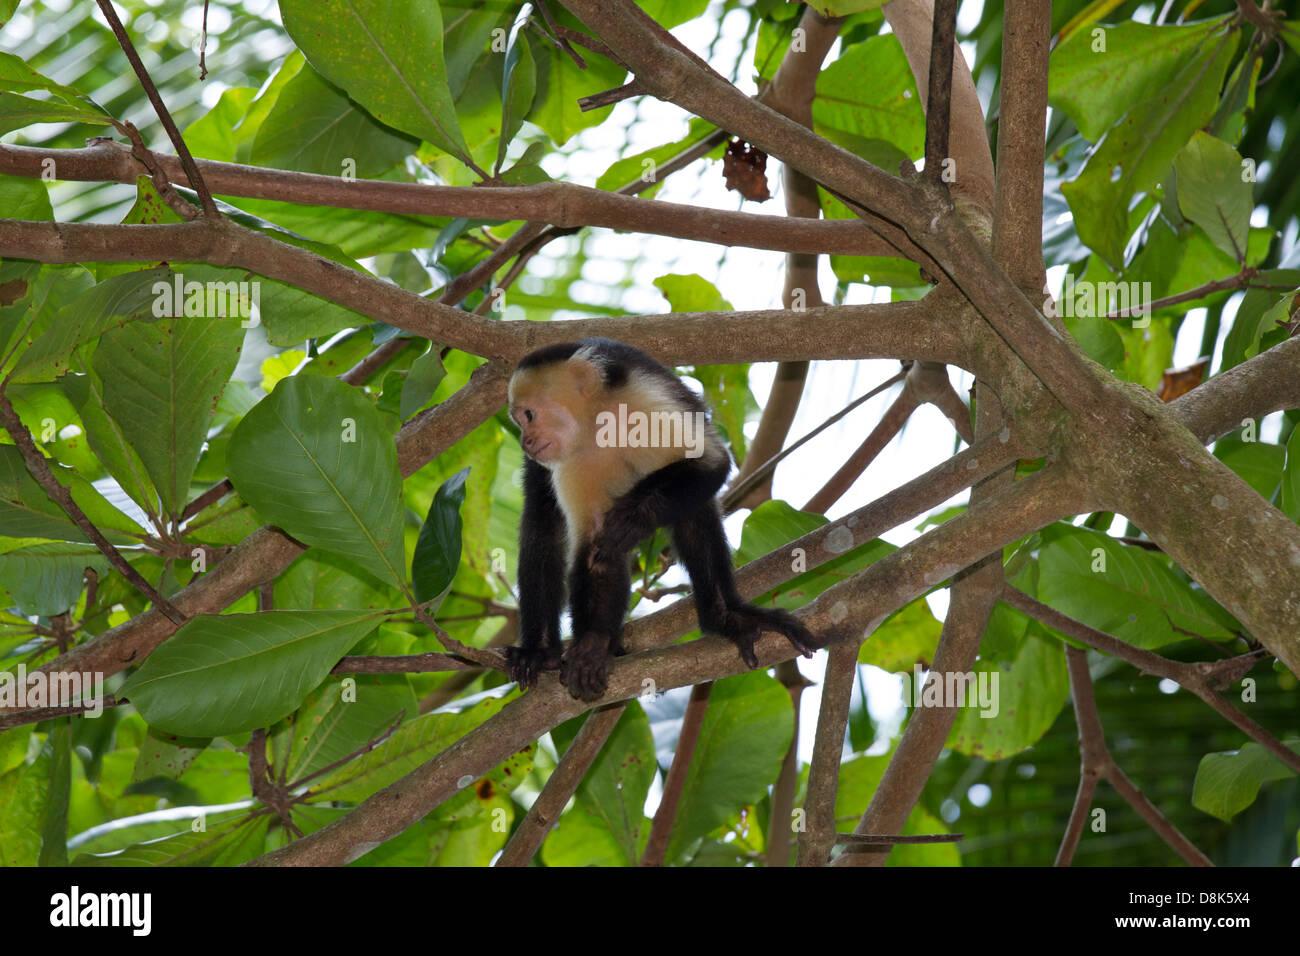 White-faced Capuchin Monkey, Cebus capucinus, Corcovado National Park, Costa Rica Stock Photo